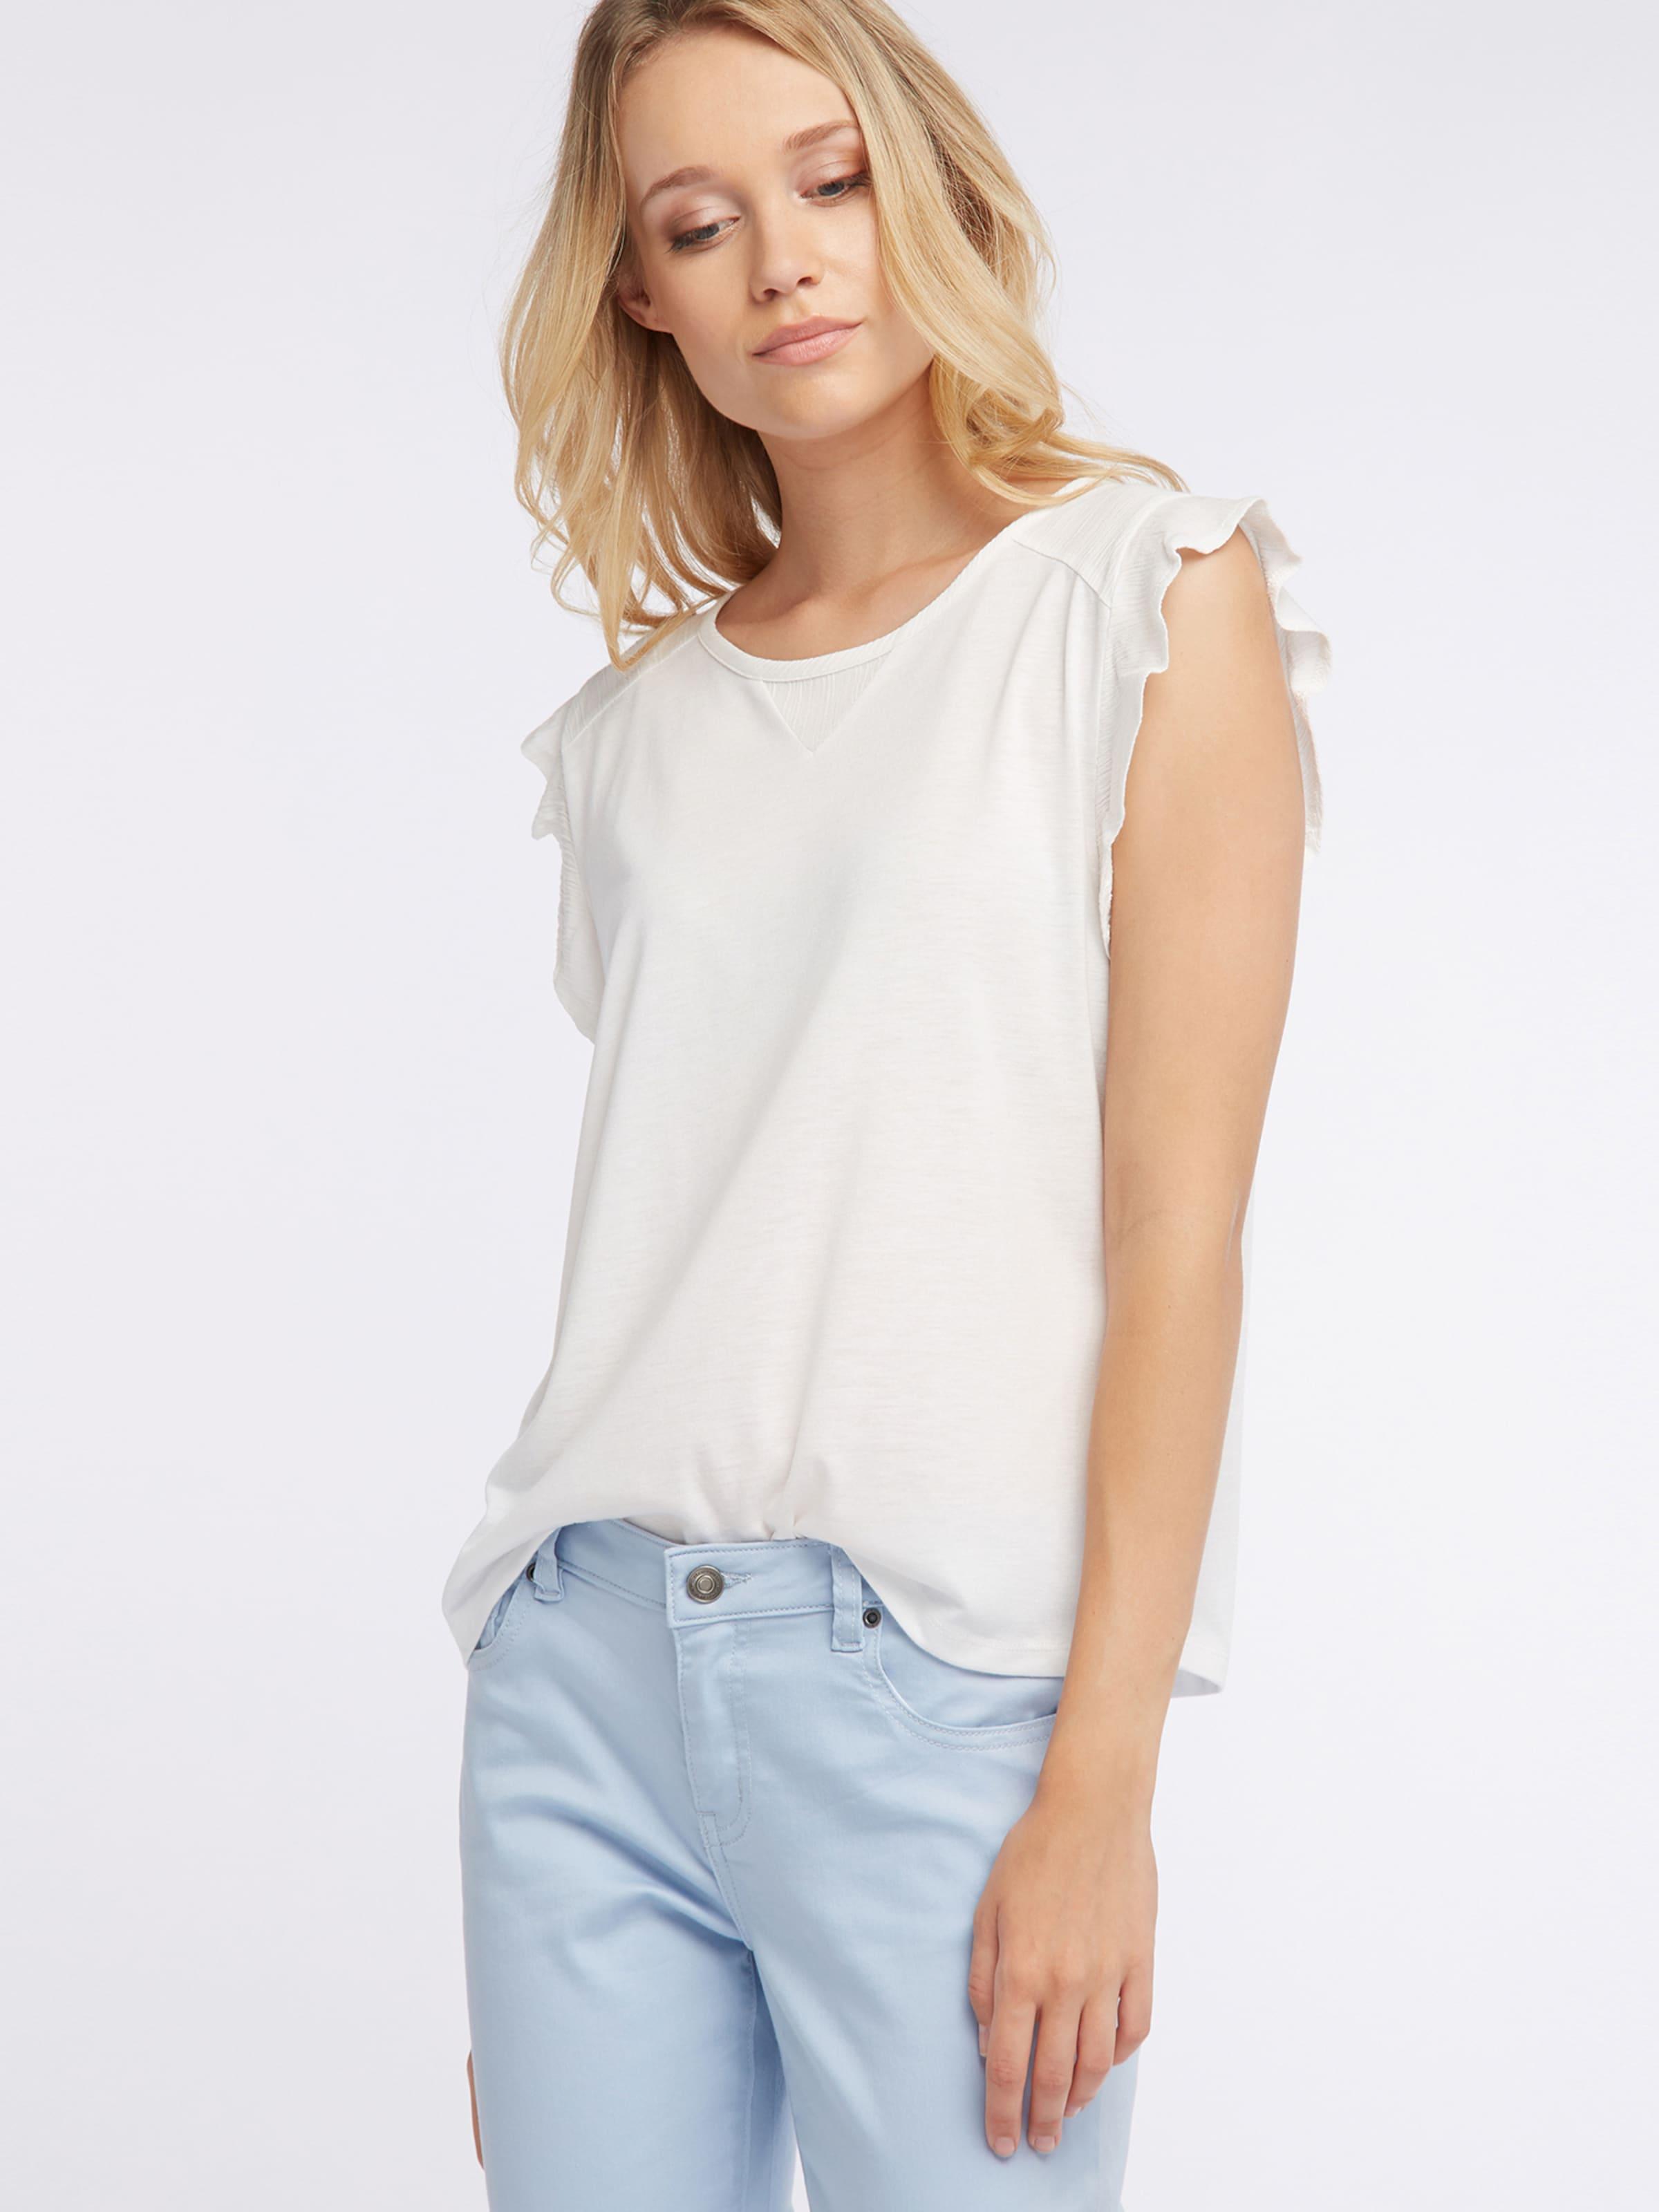 'polly' Nyc En Blanc Fashion Haut Broadway tCxrshQd